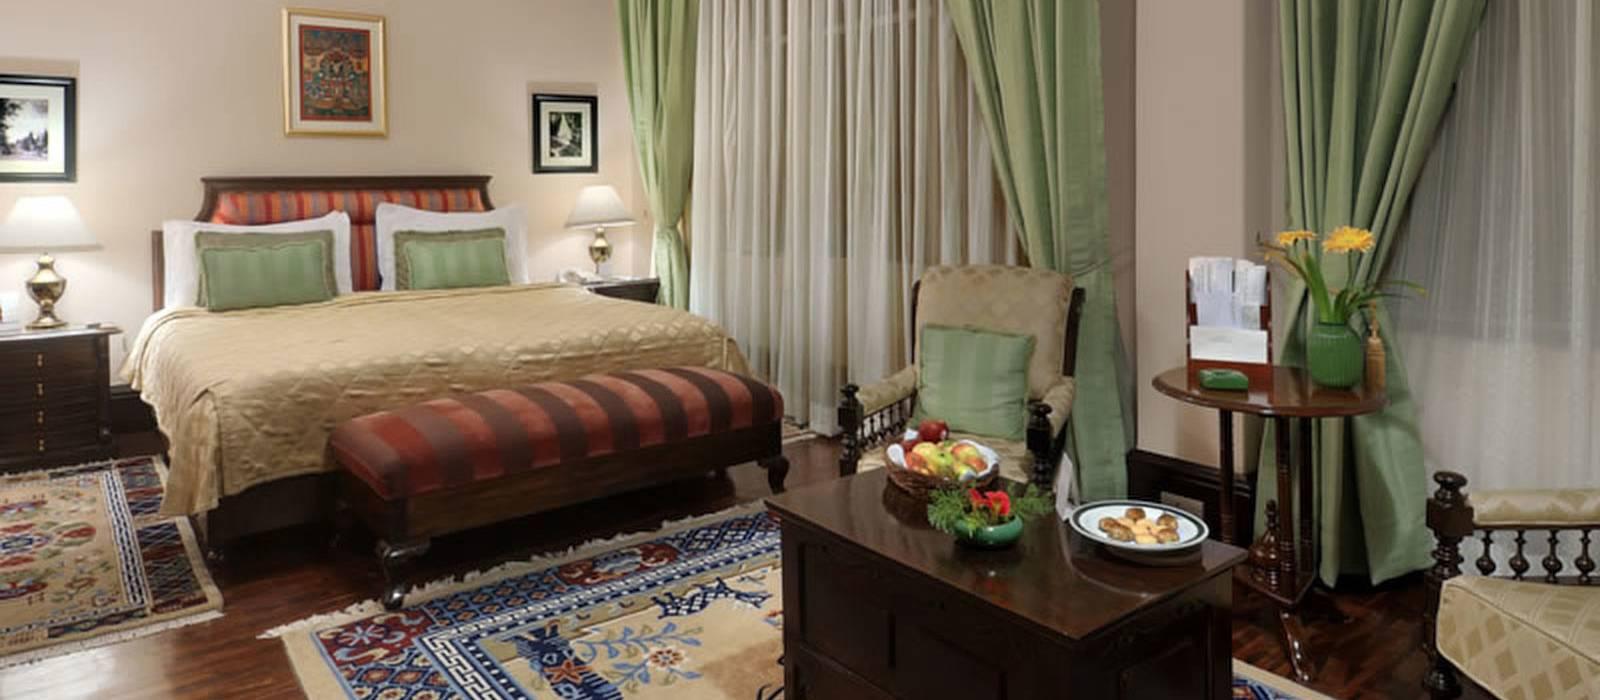 Hotel Elgin Nor Khill  East India